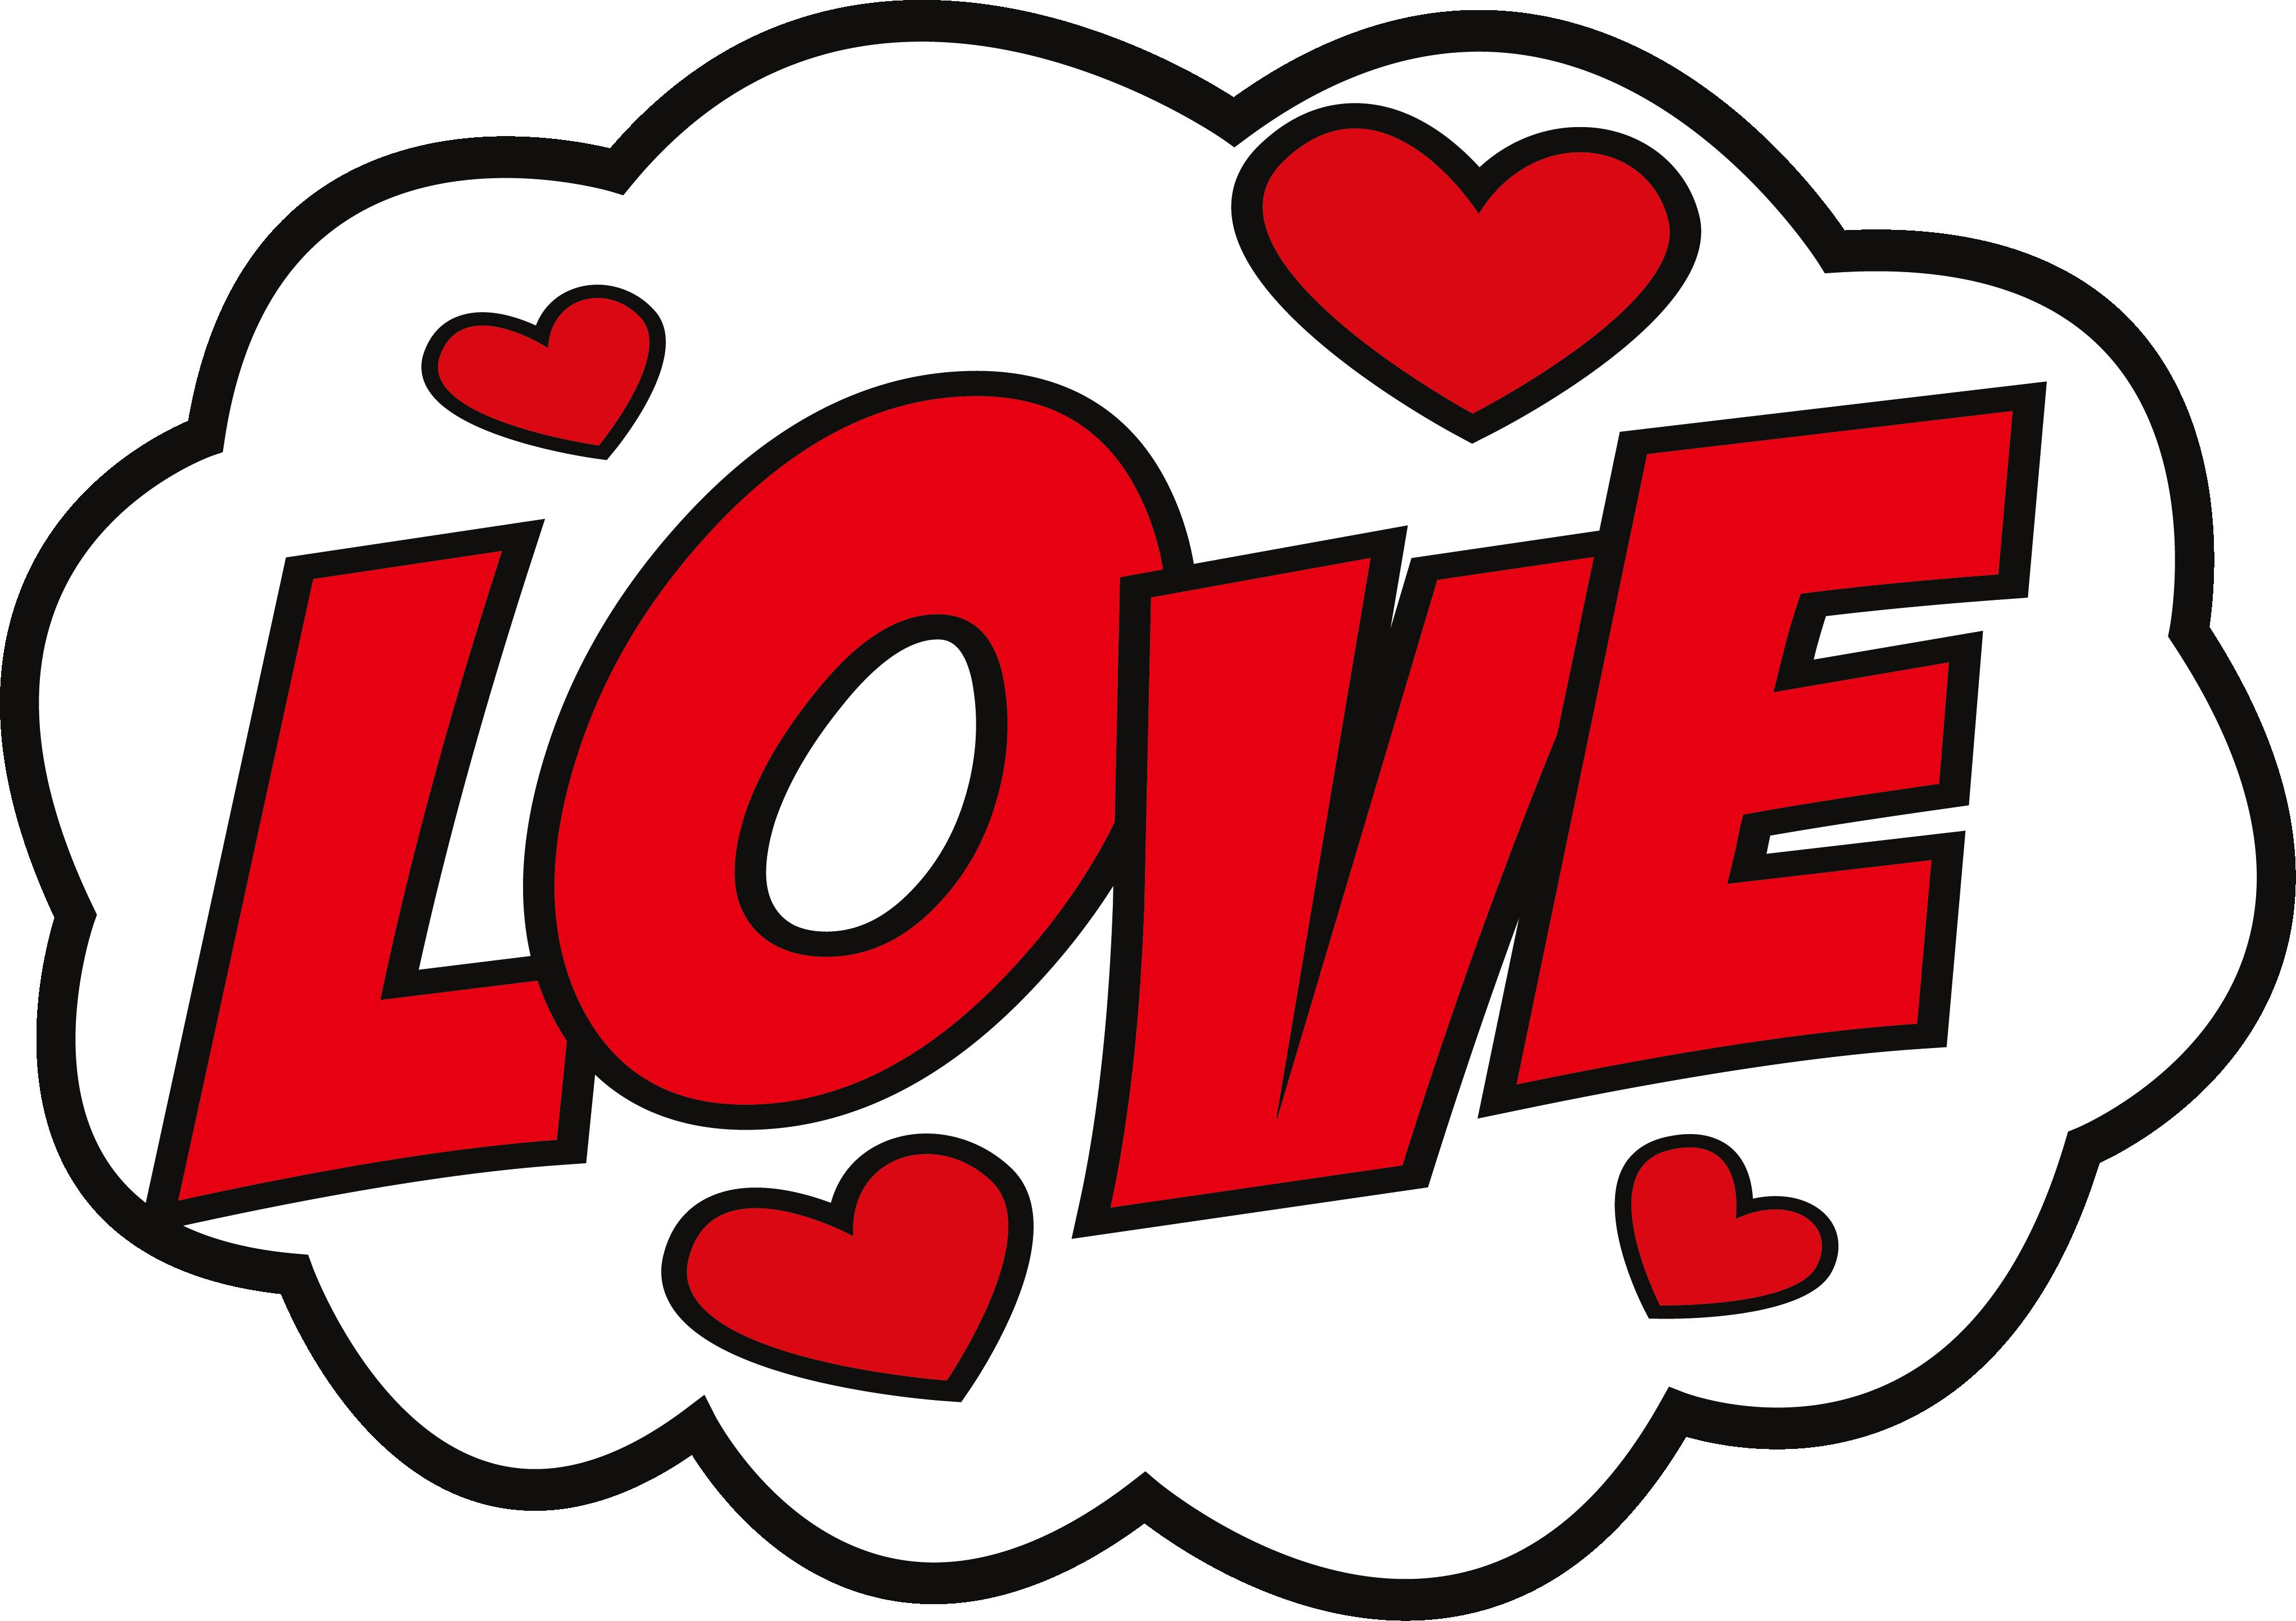 Download Sticker Love Hike Messenger.